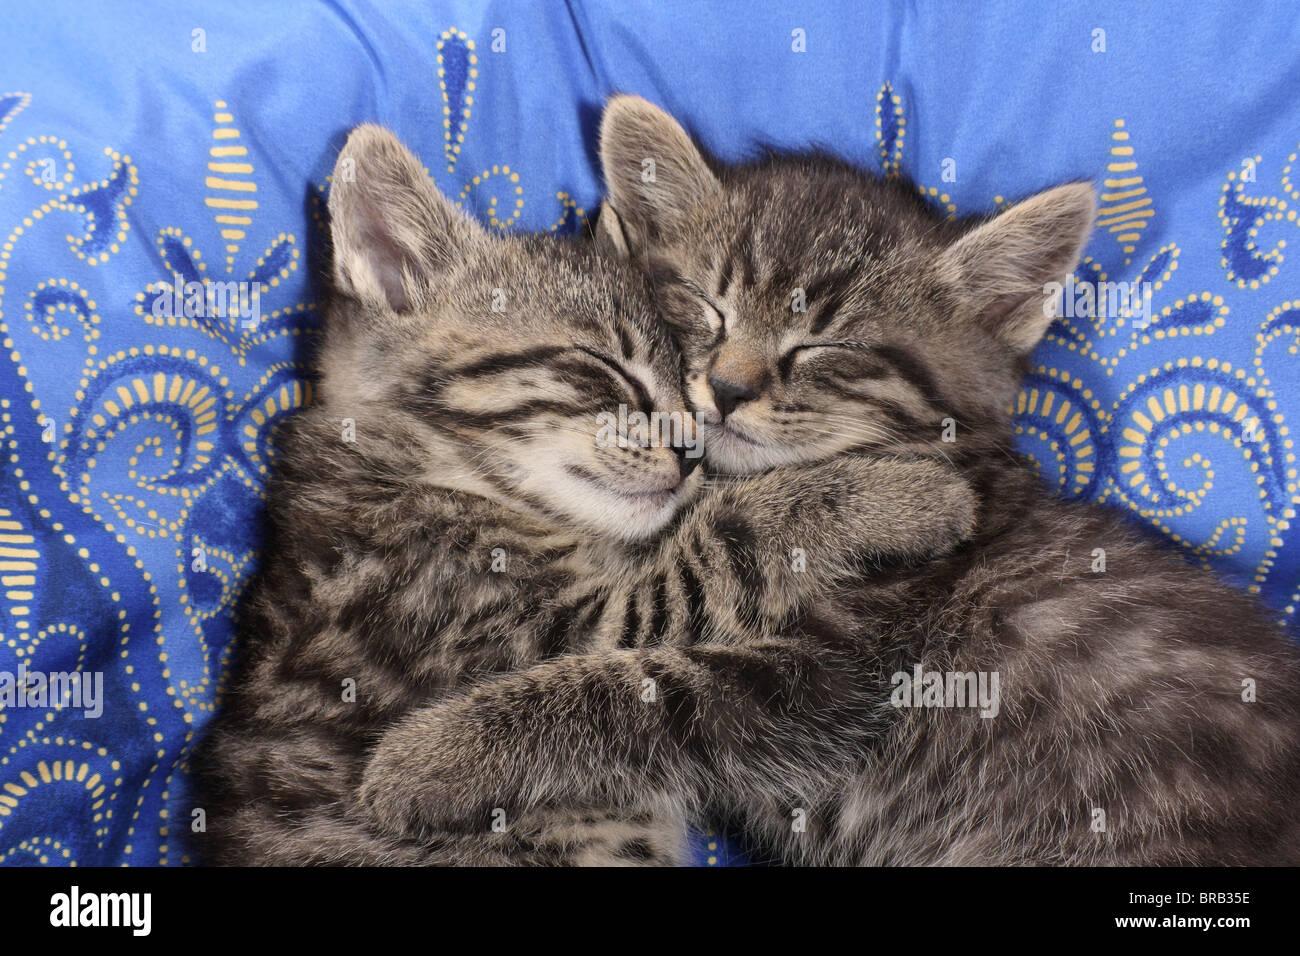 Drowsy Tabby Cat Lying In 28 Images Kitten Animal